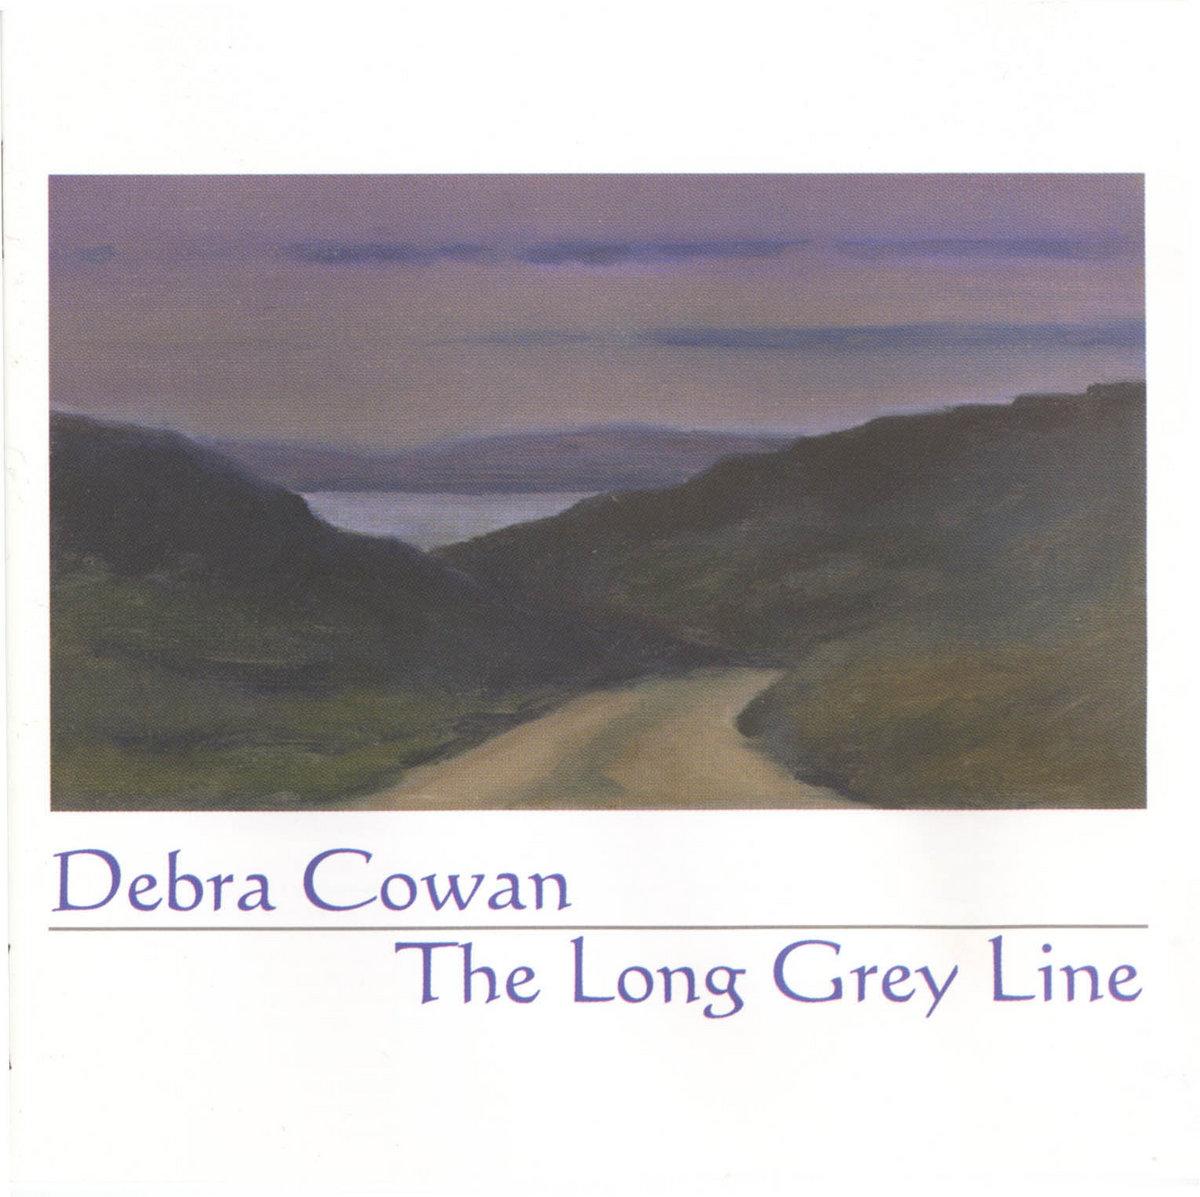 The Bold Princess Royal/The Olde favourite | Debra Cowan